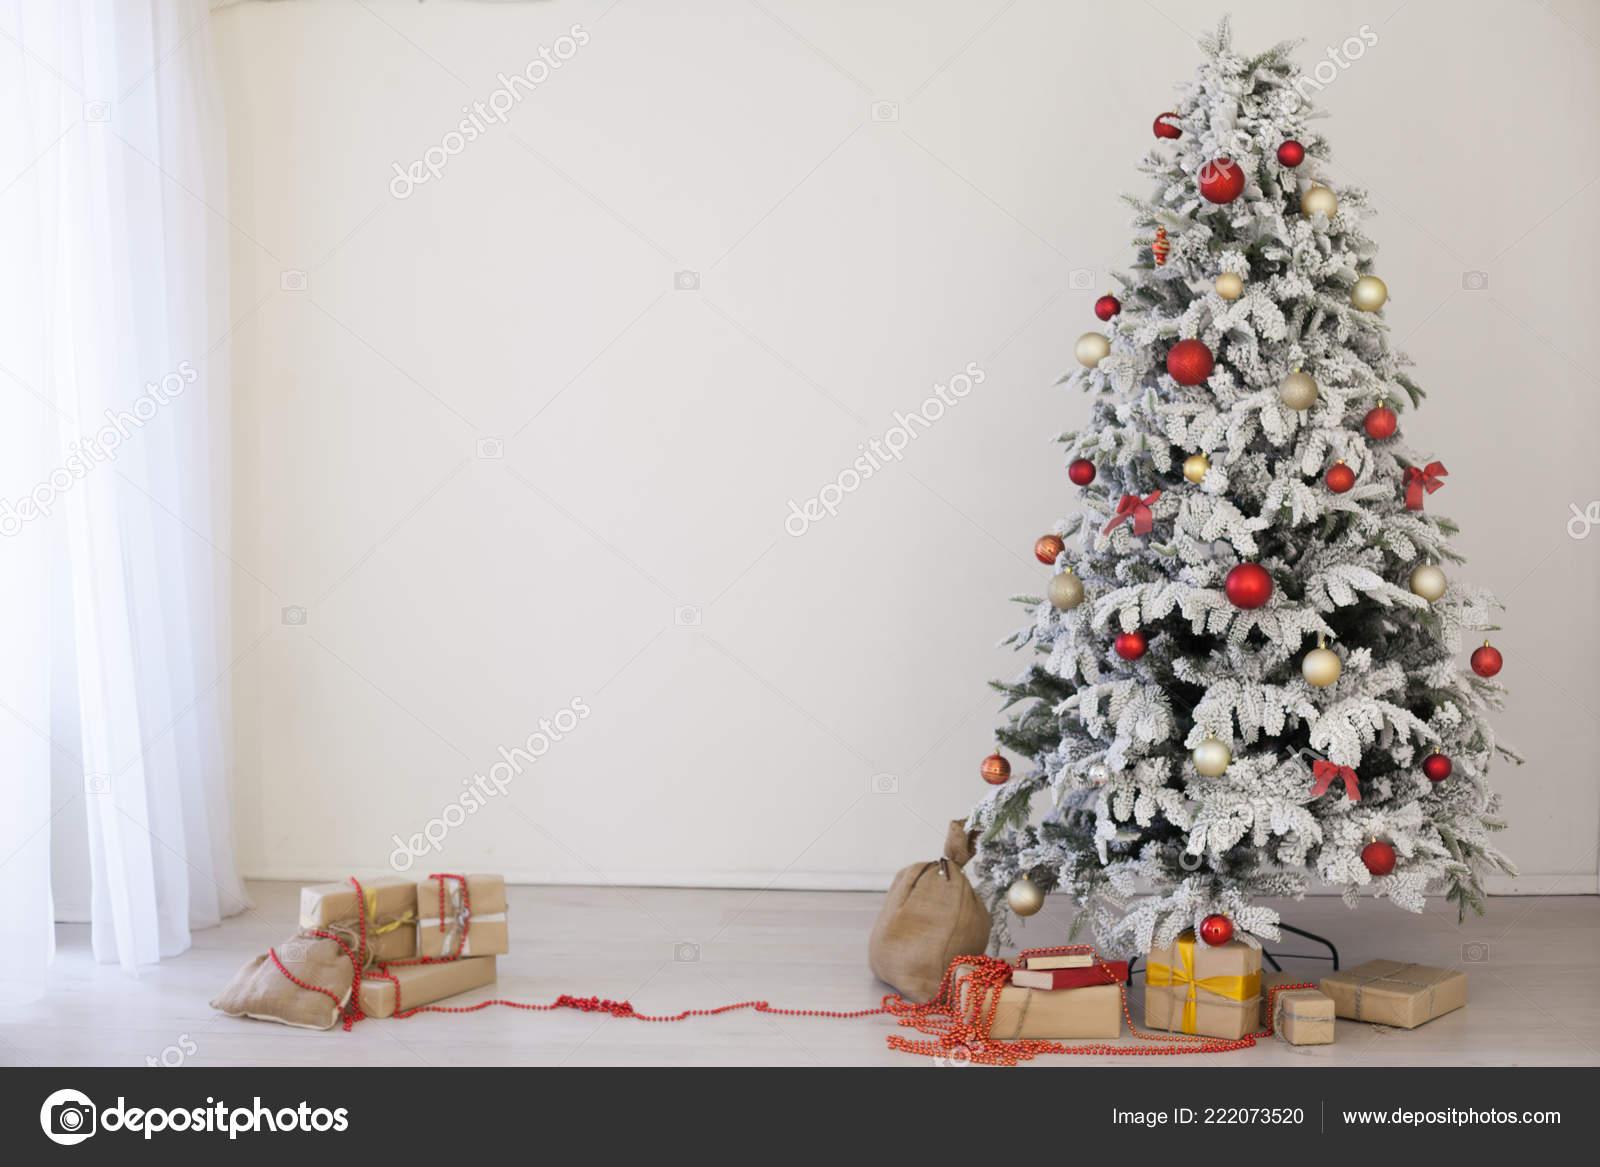 Green Christmas Tree Christmas Gifts White Room — Stock Photo ...